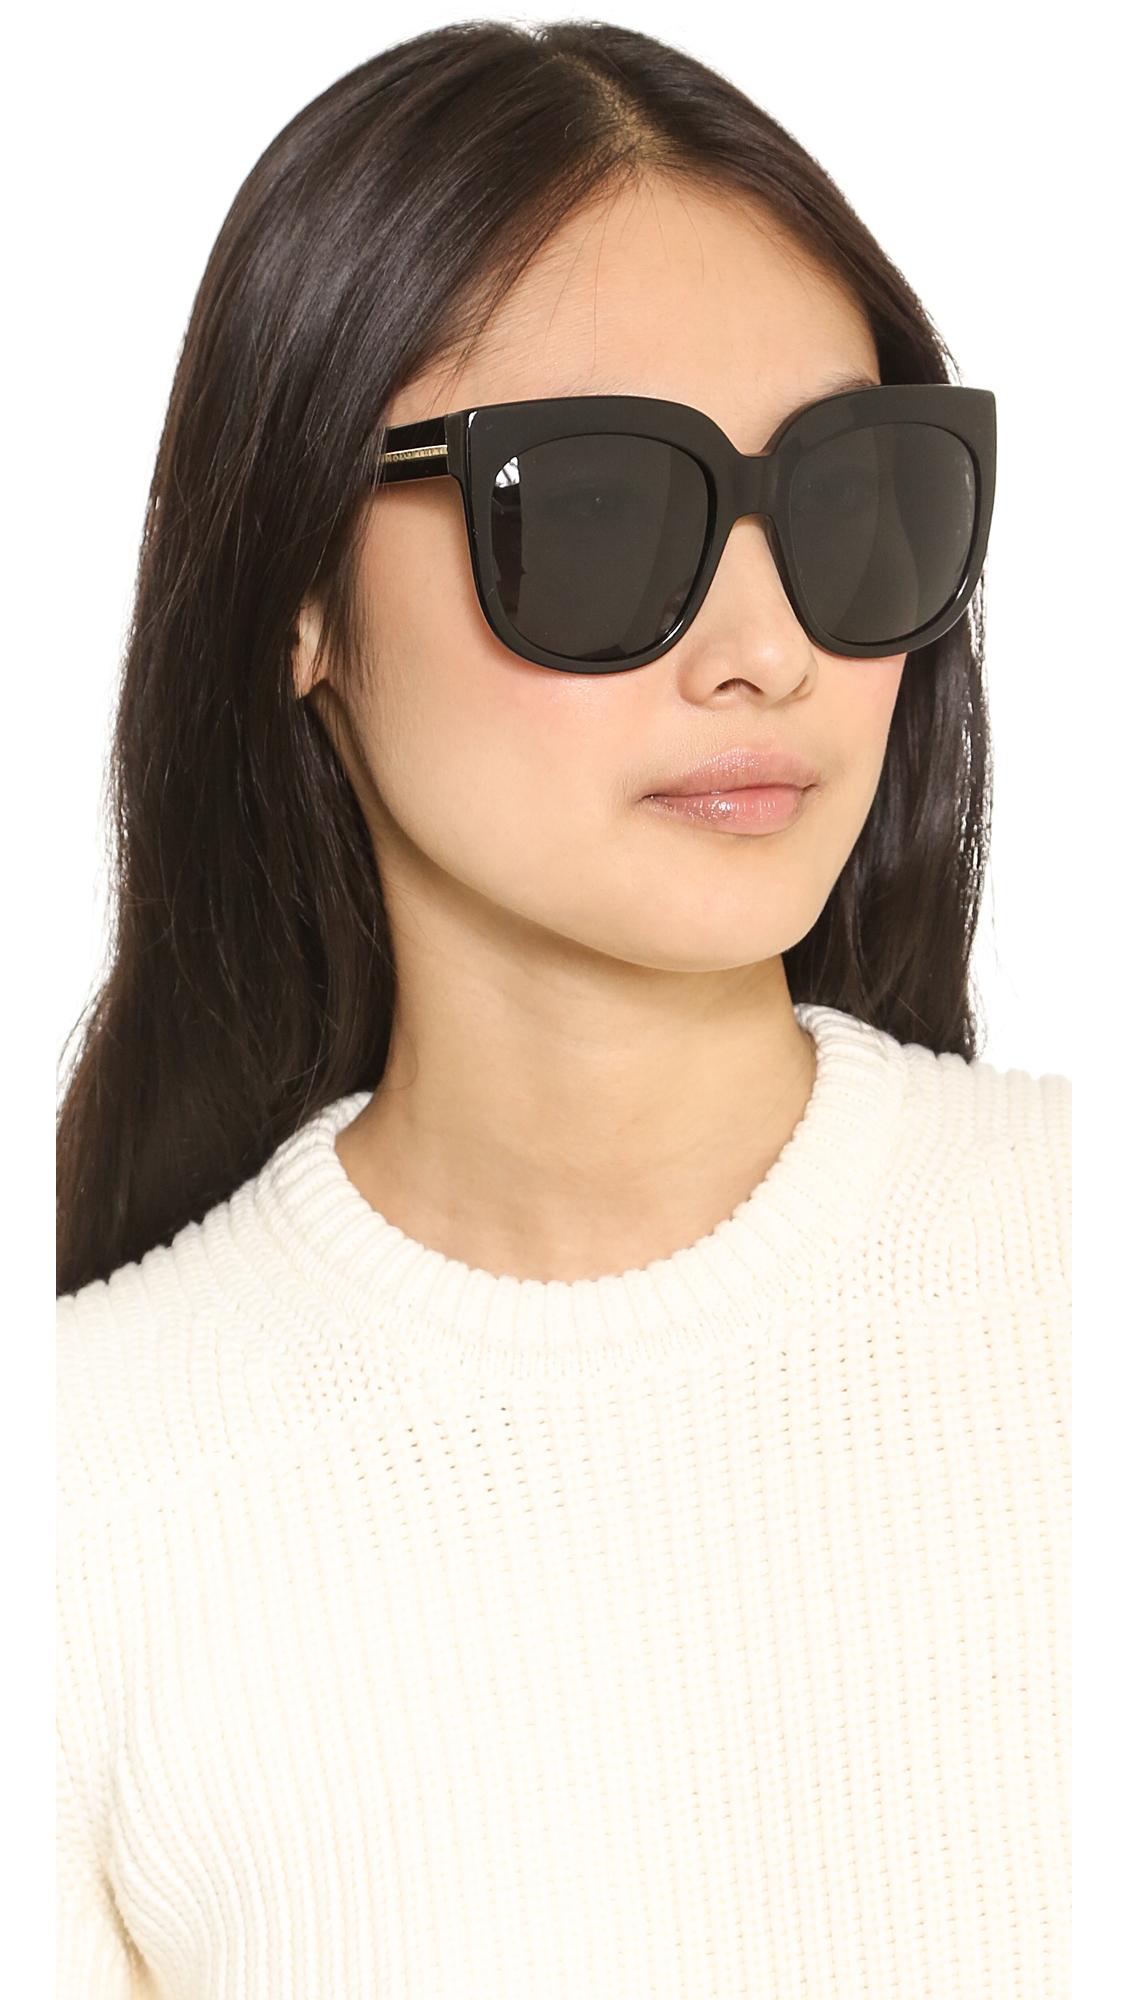 oversized sunglasses  Stella mccartney Oversized Sunglasses - Nude/Brown in Black